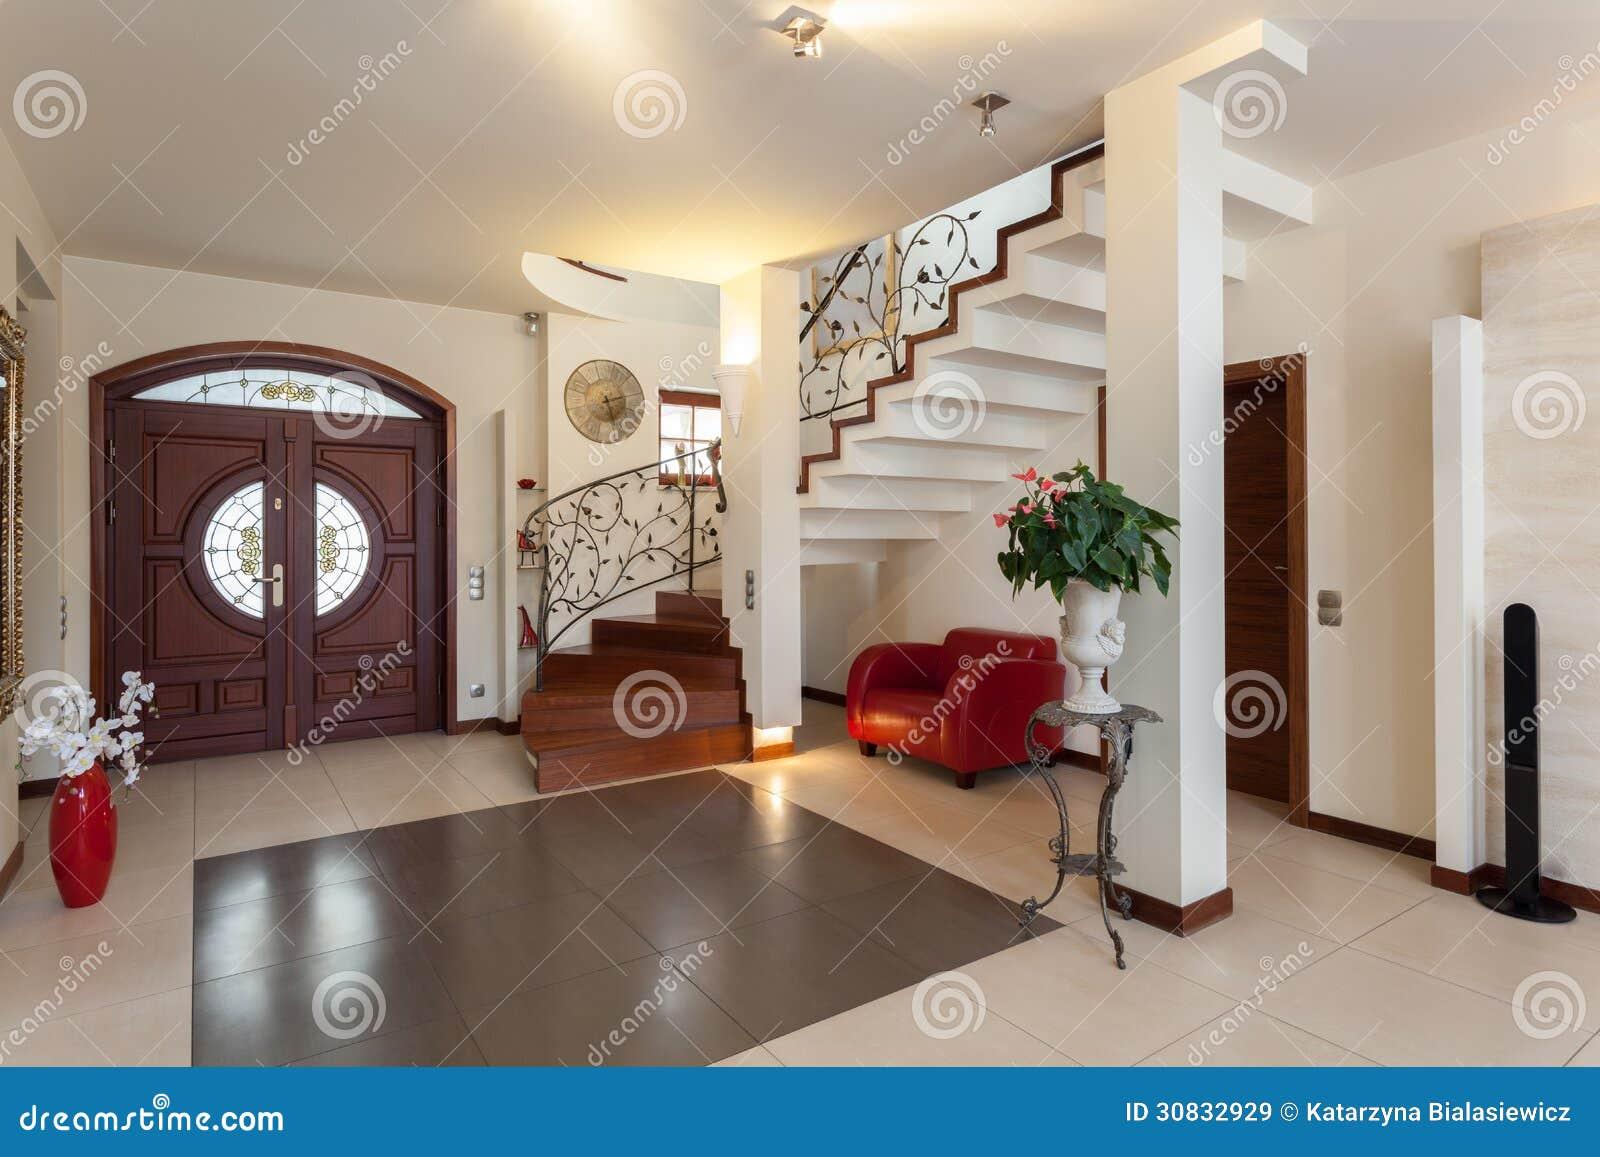 Elegant huis ingang royalty vrije stock afbeeldingen afbeelding 30832929 - Huis ingang ...